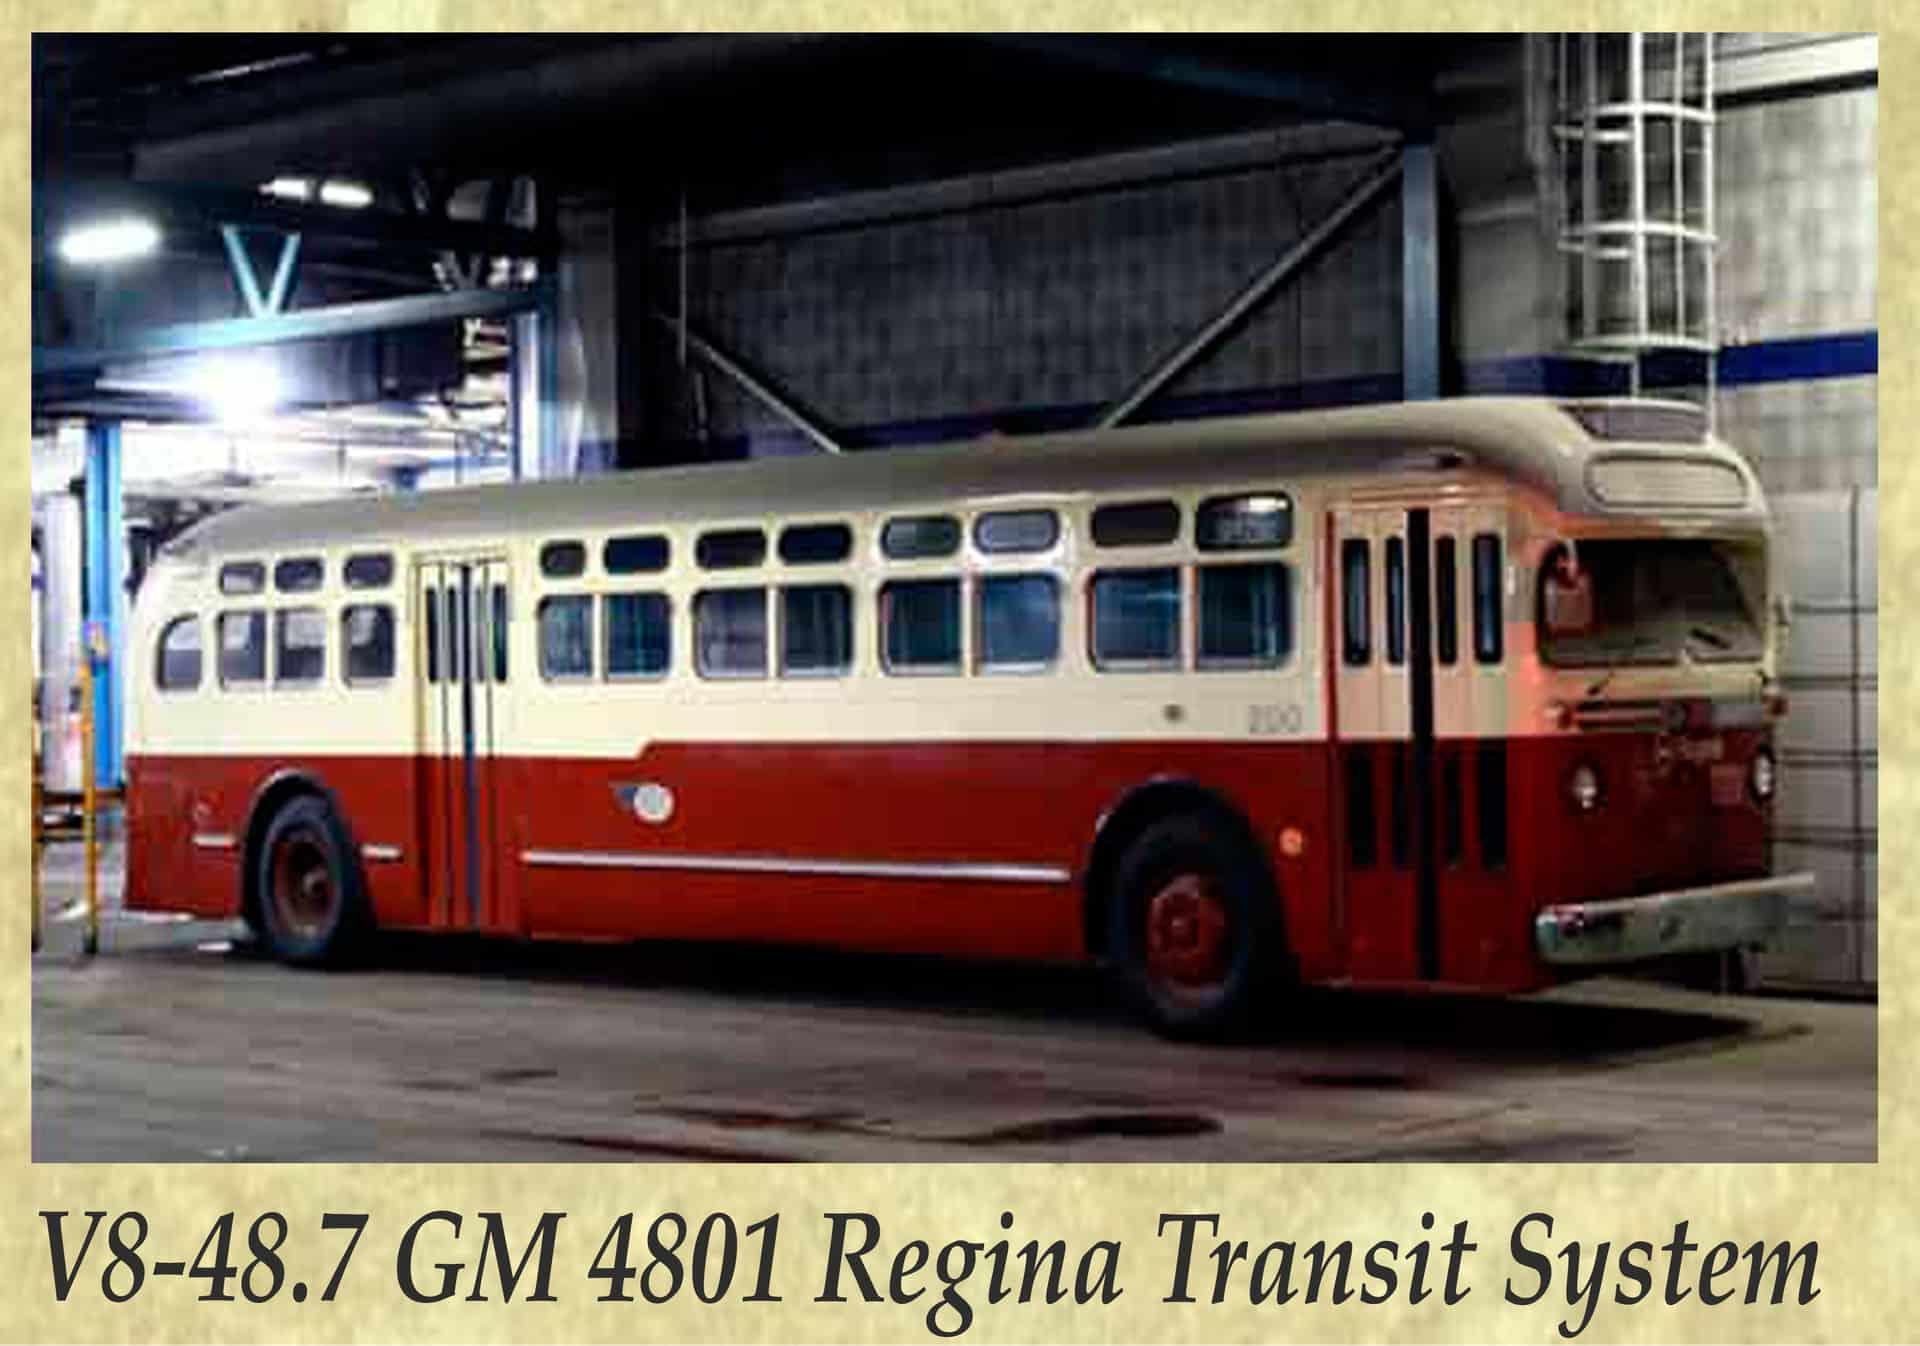 V8-48.7 GM 4801 Regina Transit System